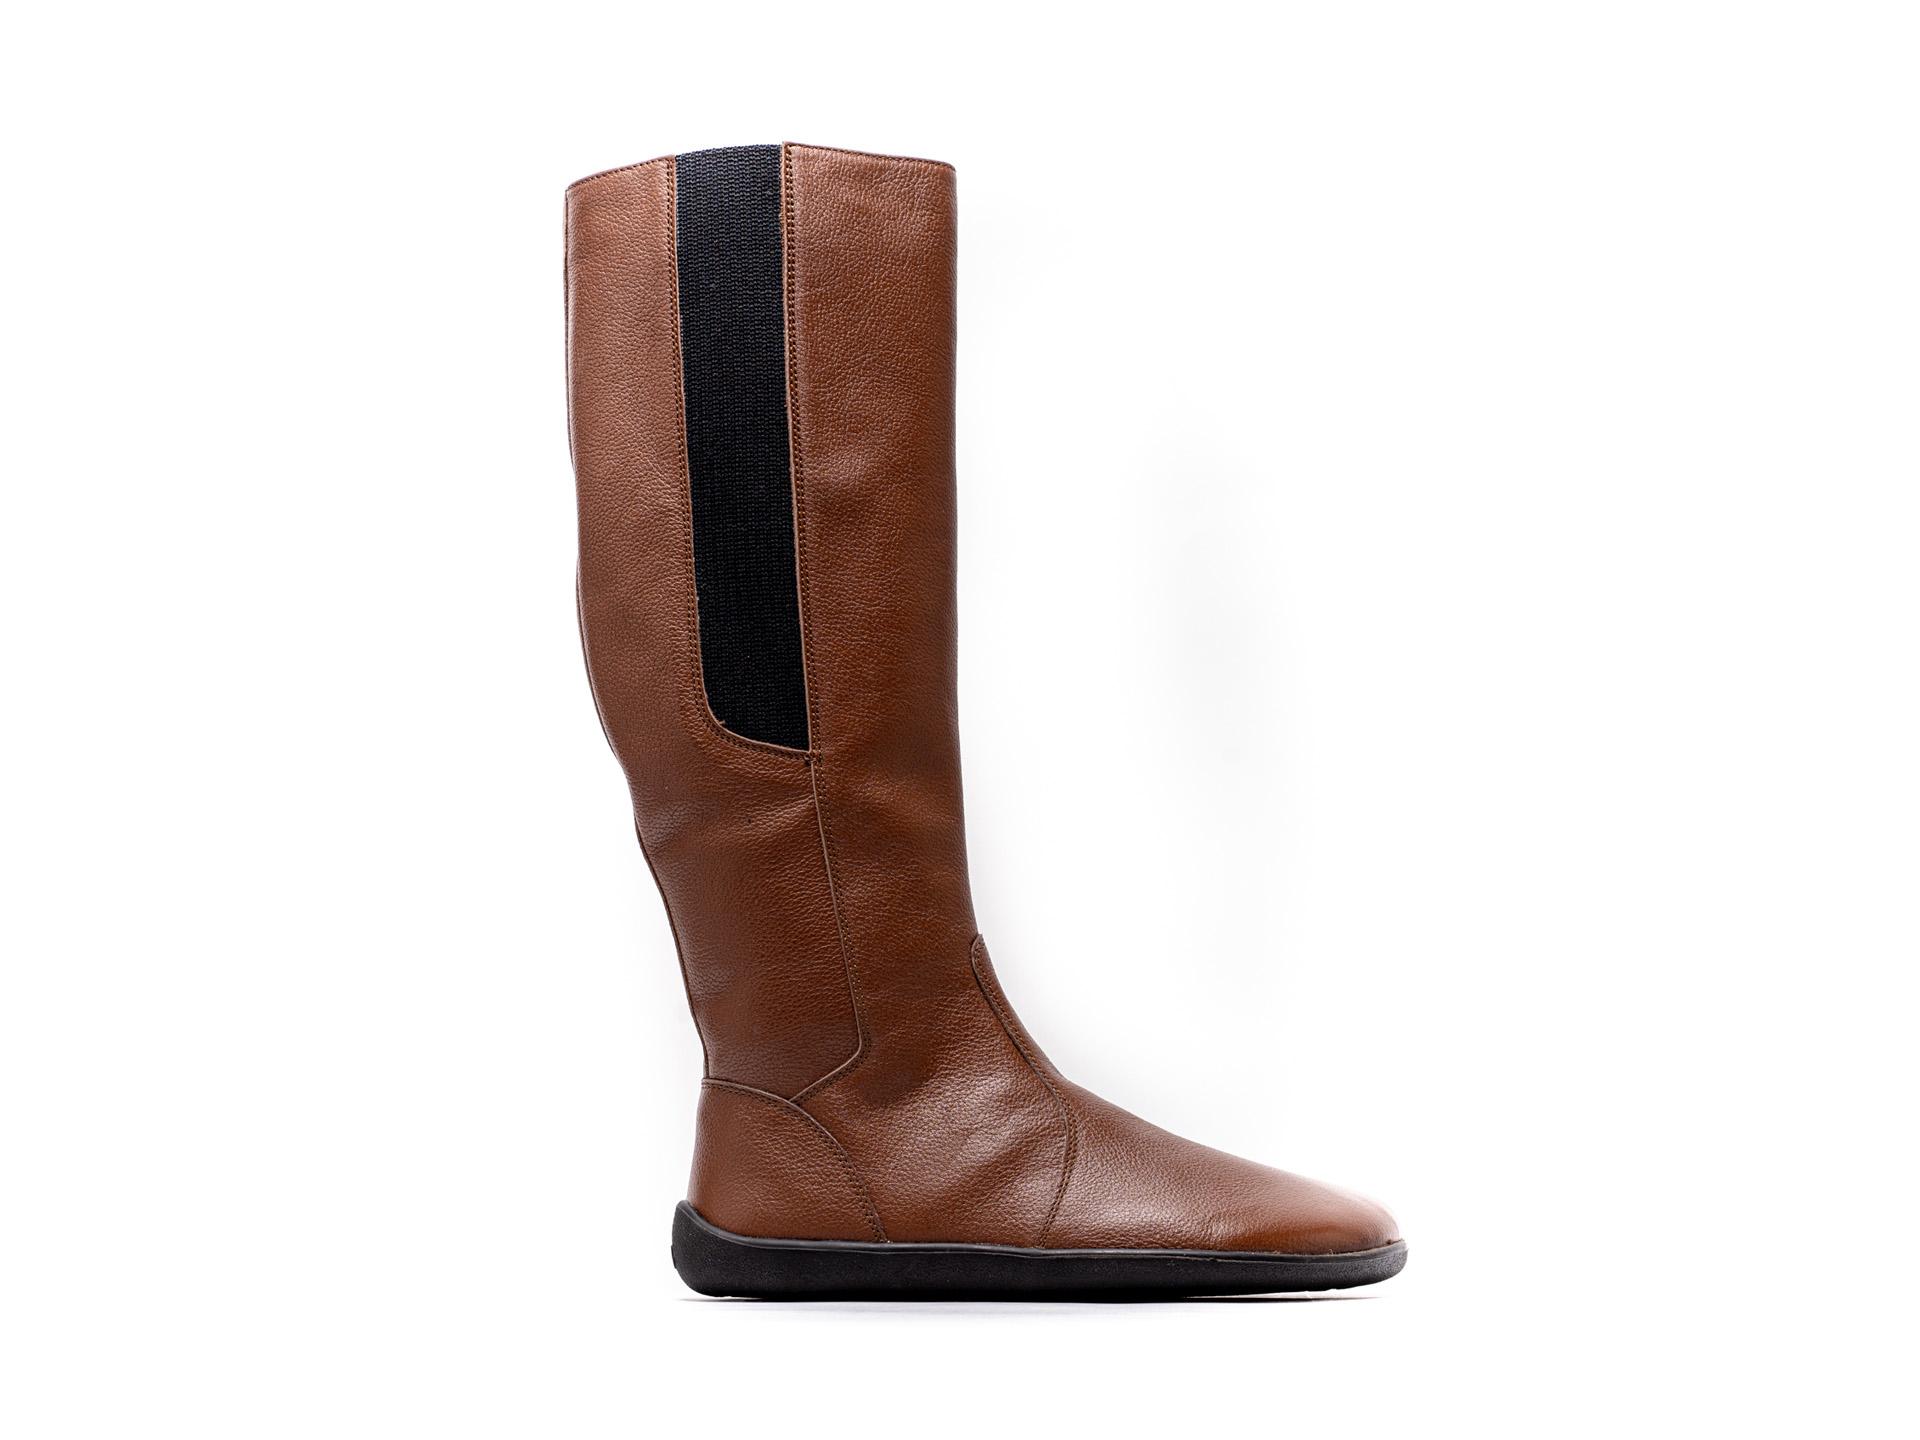 Barefoot čižmy Be Lenka Sierra – Brown 37